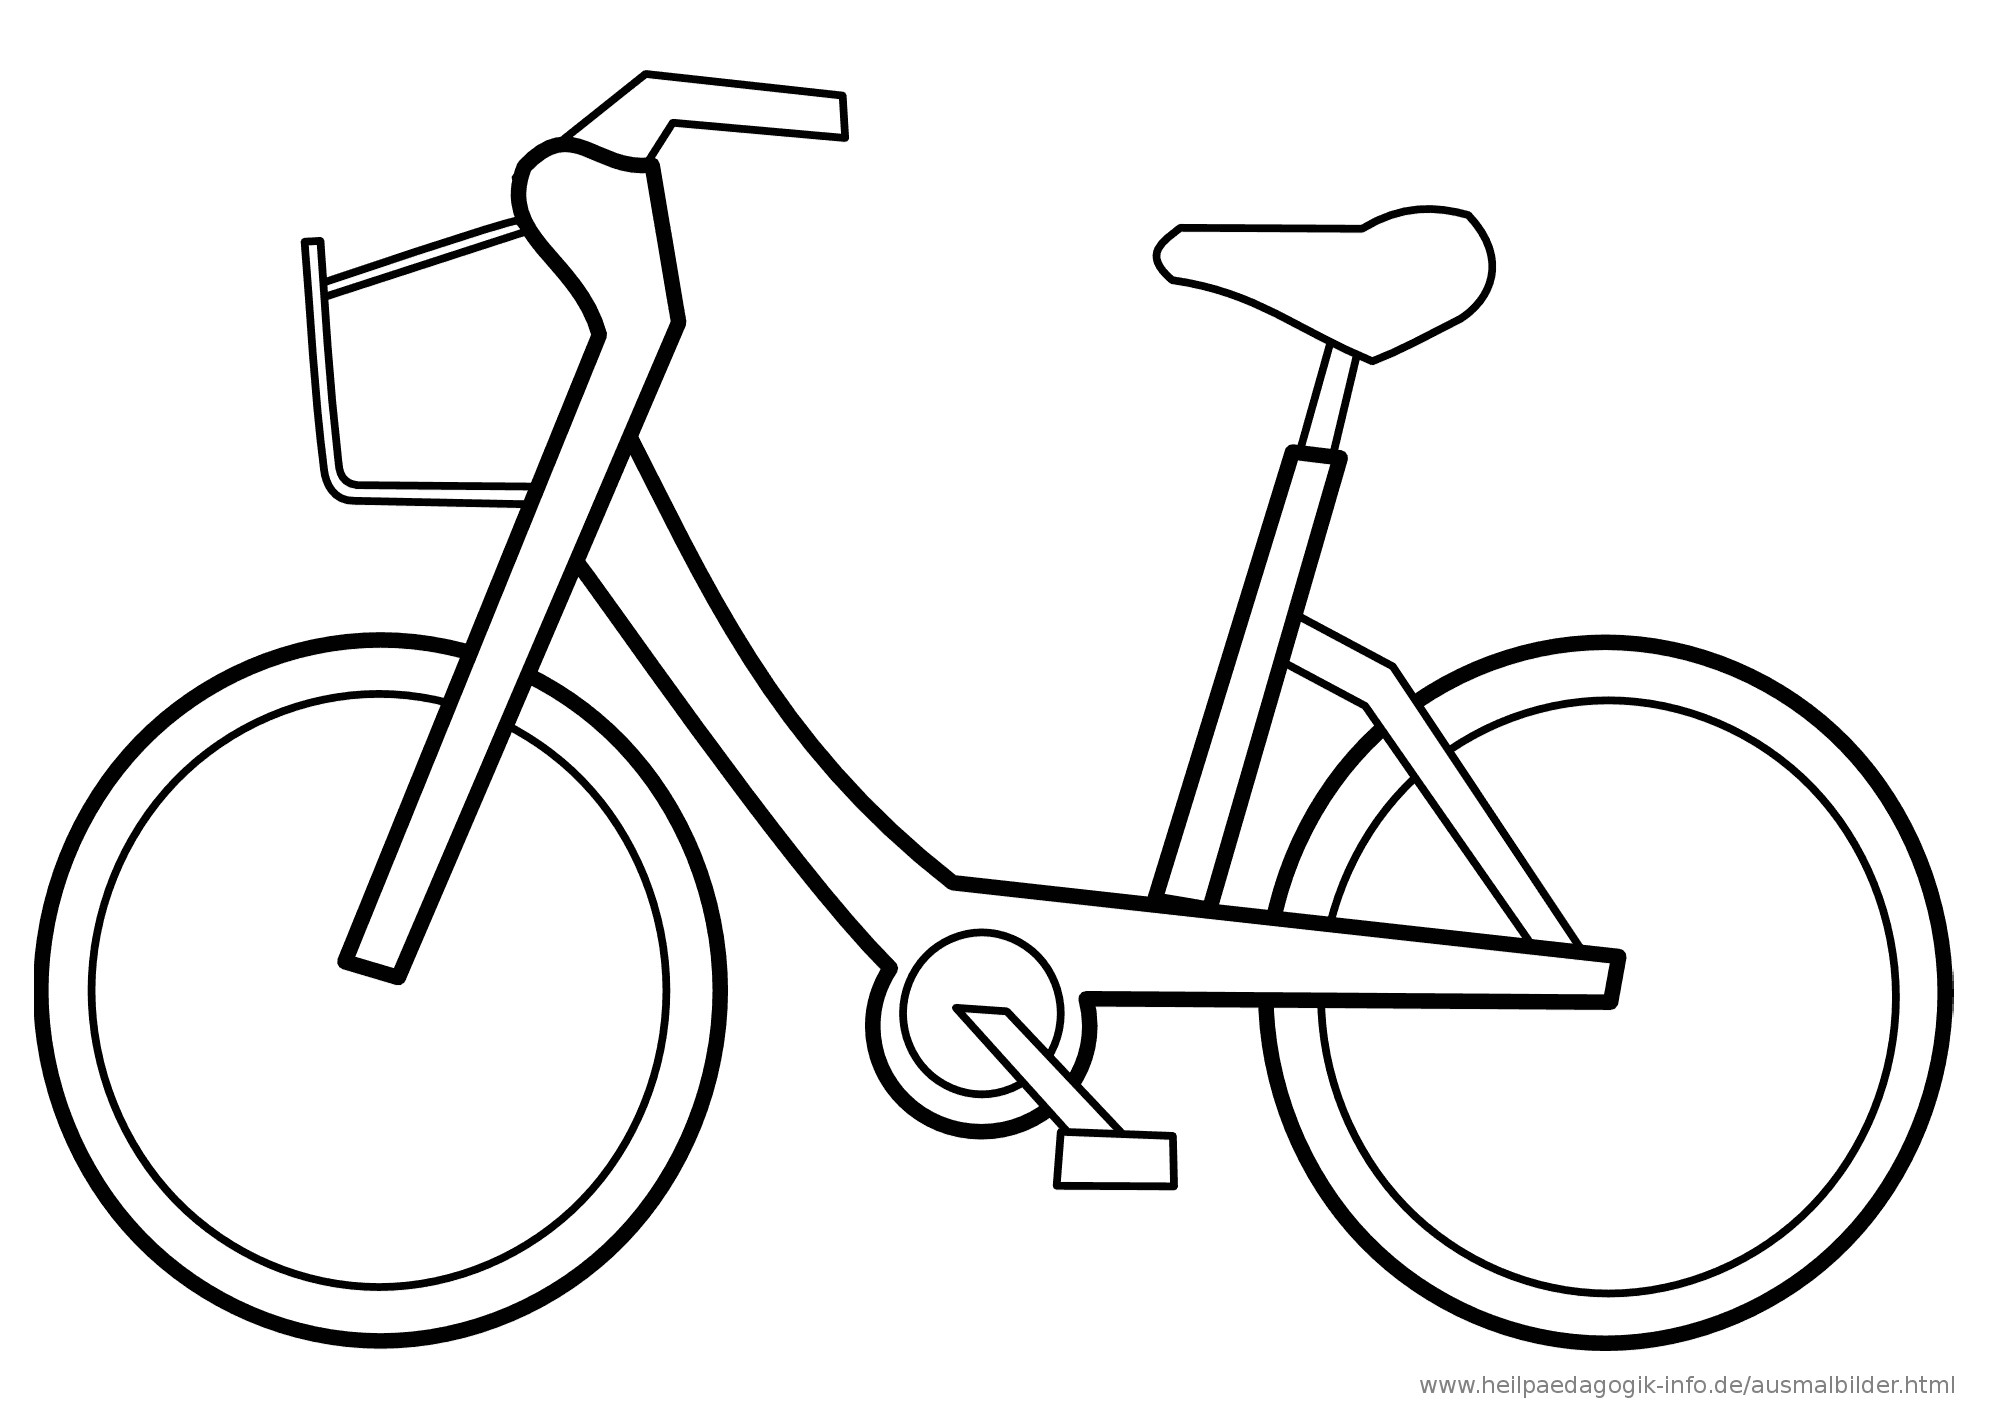 Ausmalbilder Fahrrad  301 Moved Permanently